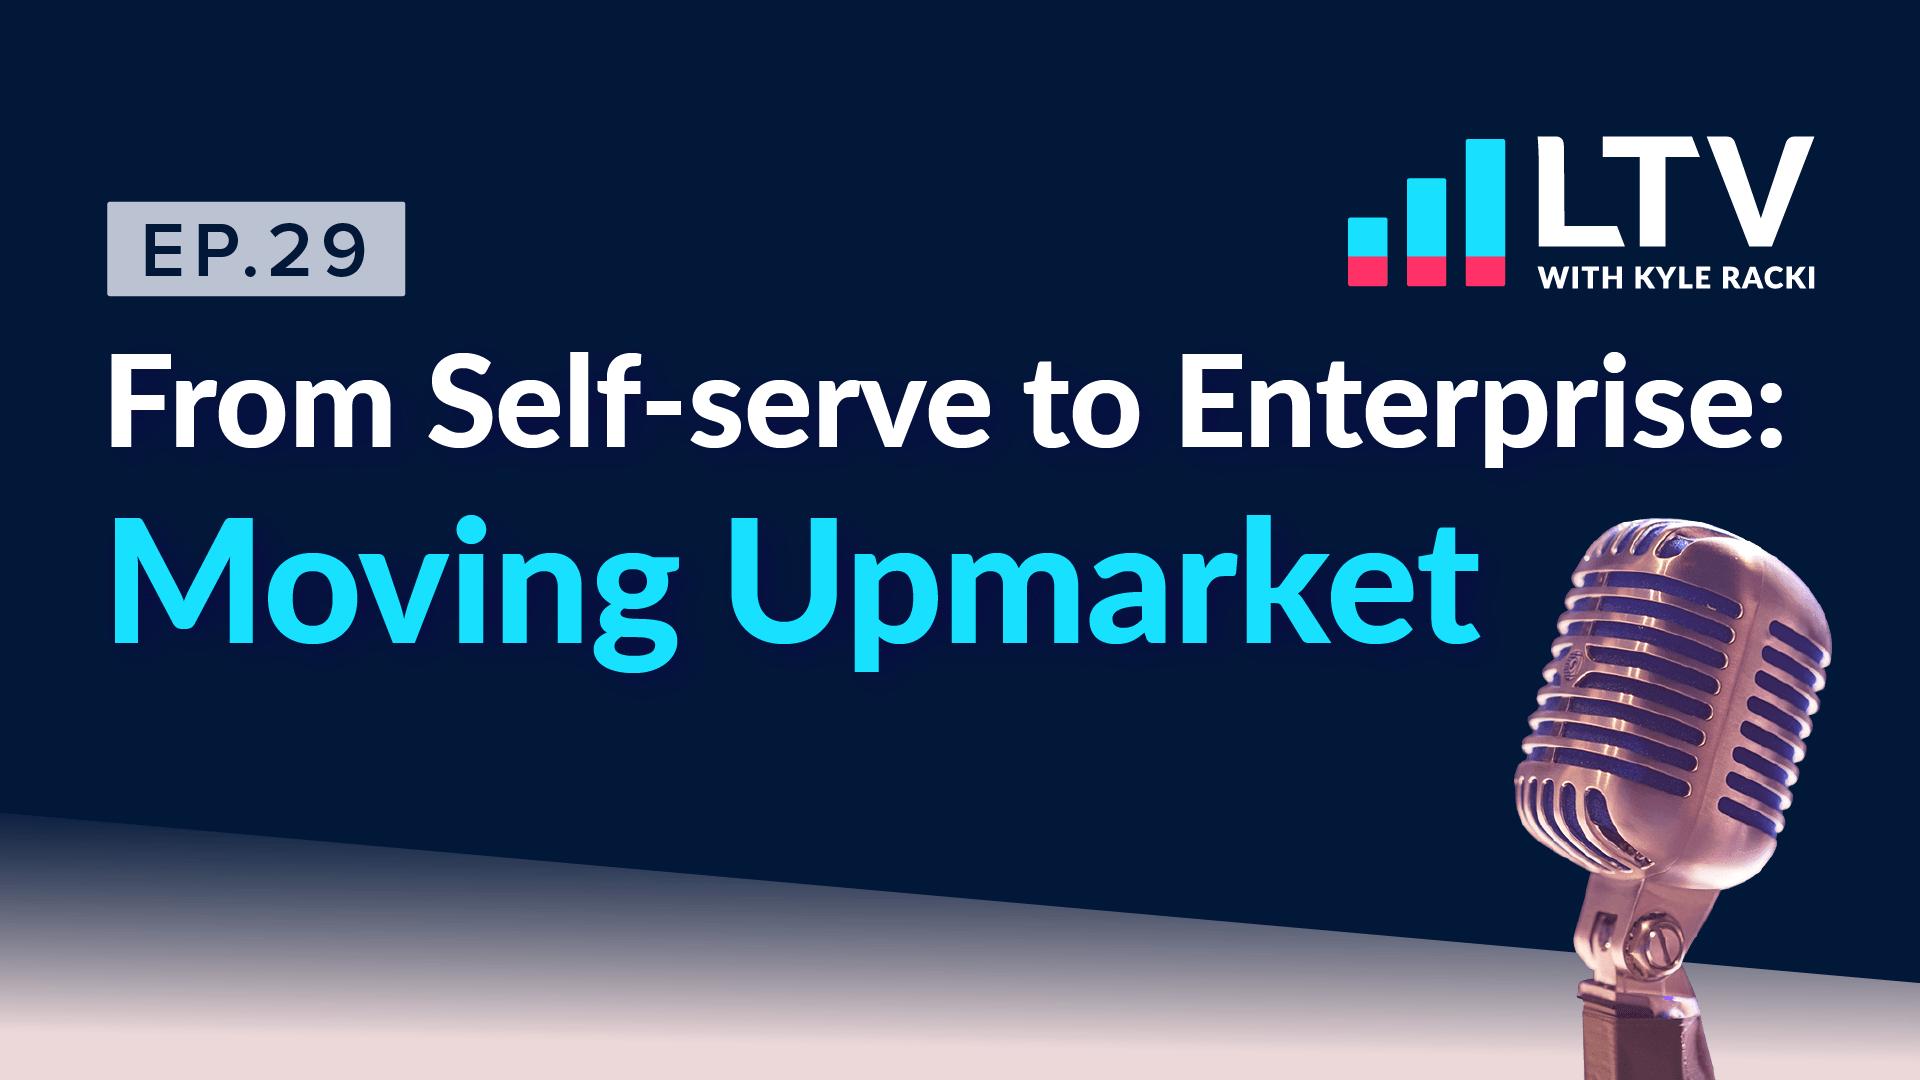 LTV Podcast Ep. 29 From Self-serve to Enterprise: Moving Upmarket